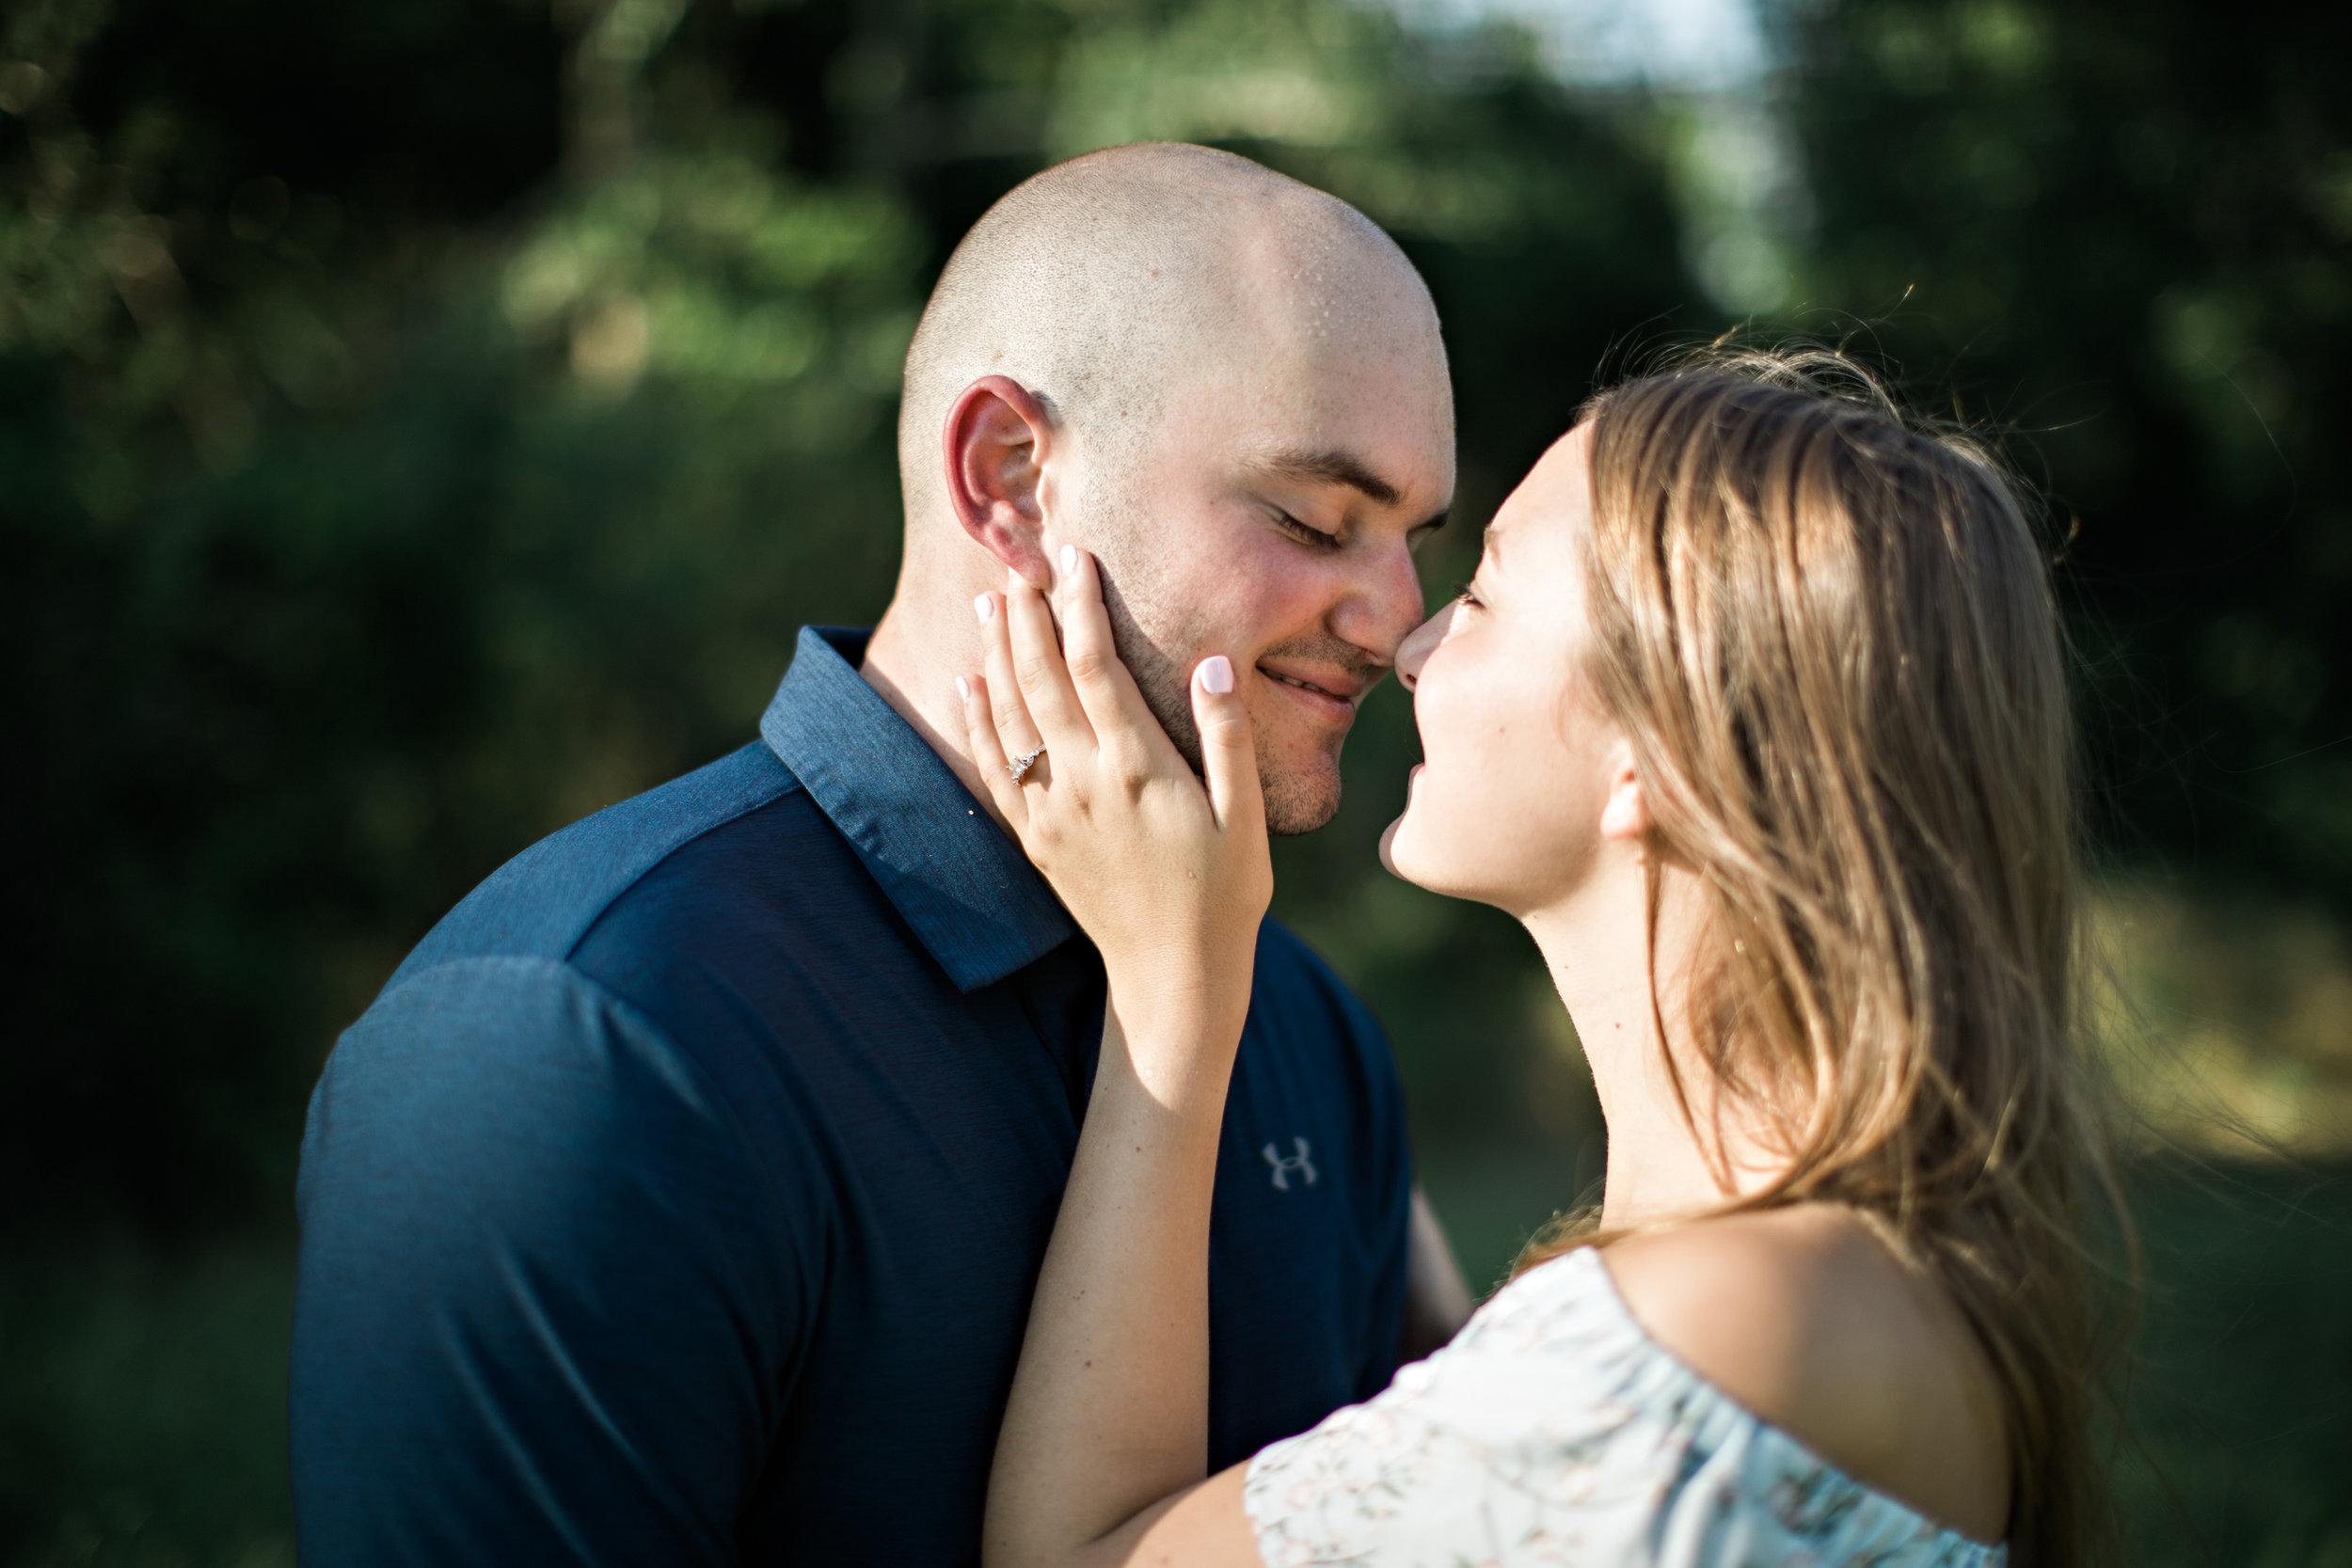 Alabama-Engagement-Photography-Montgomery-Nick-Drollette-Emily and Zakk-111.jpg